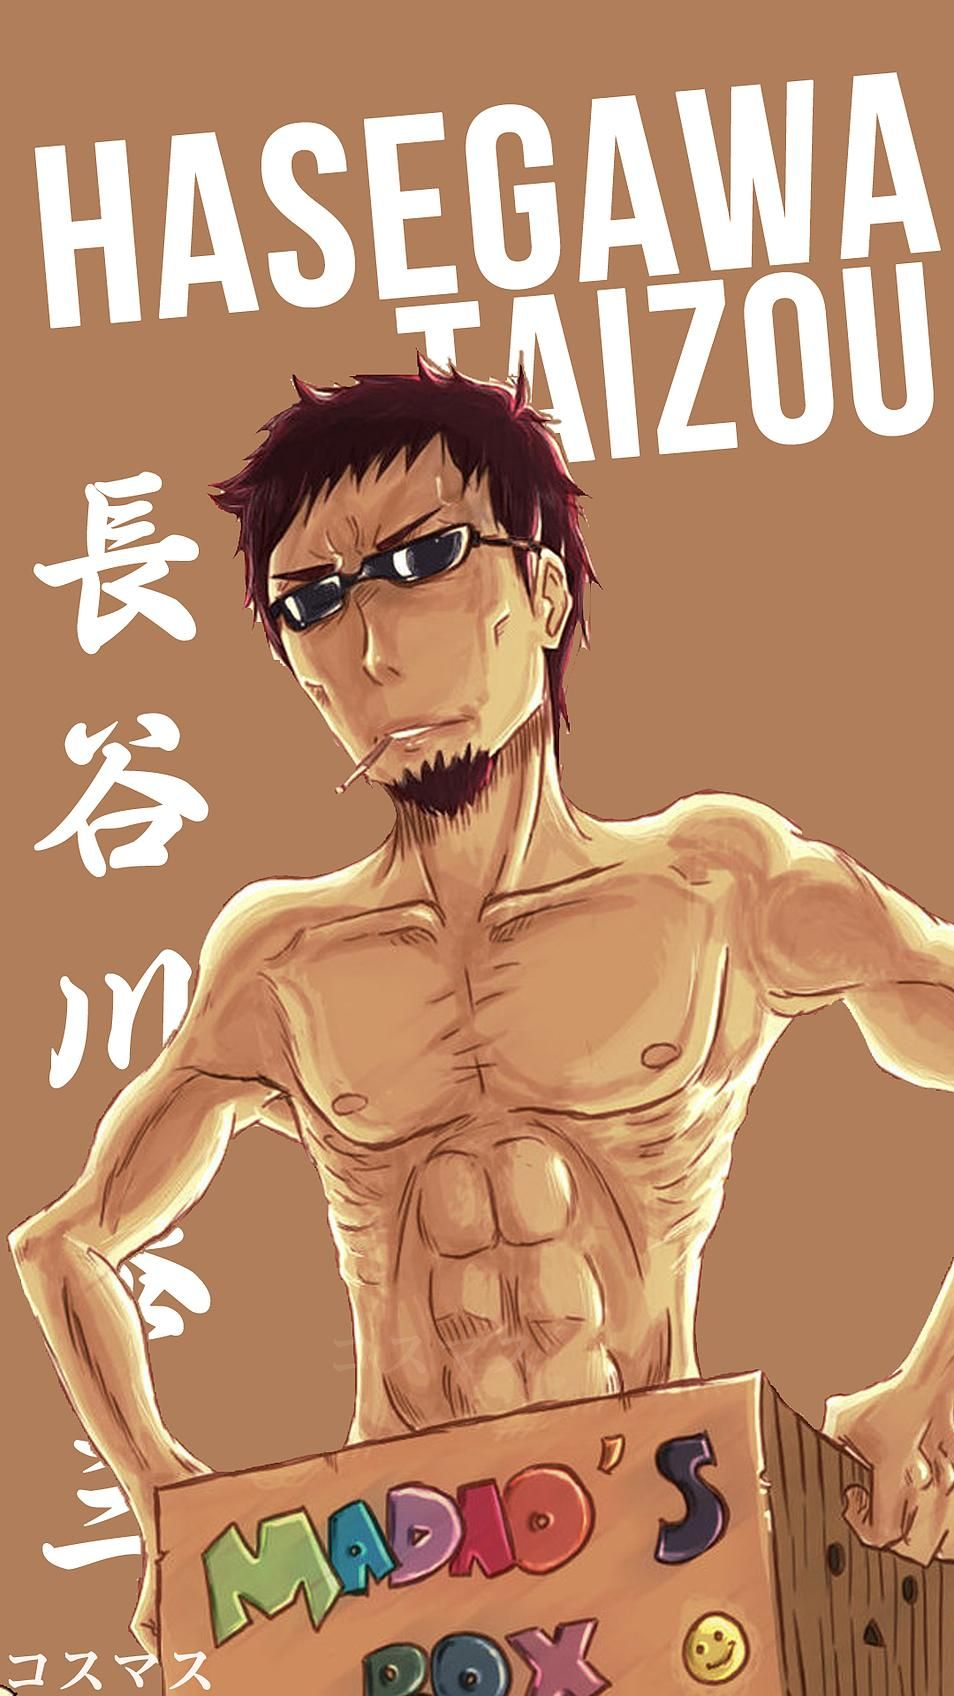 Hasegawa Taizou Korigengi Wallpaper Anime